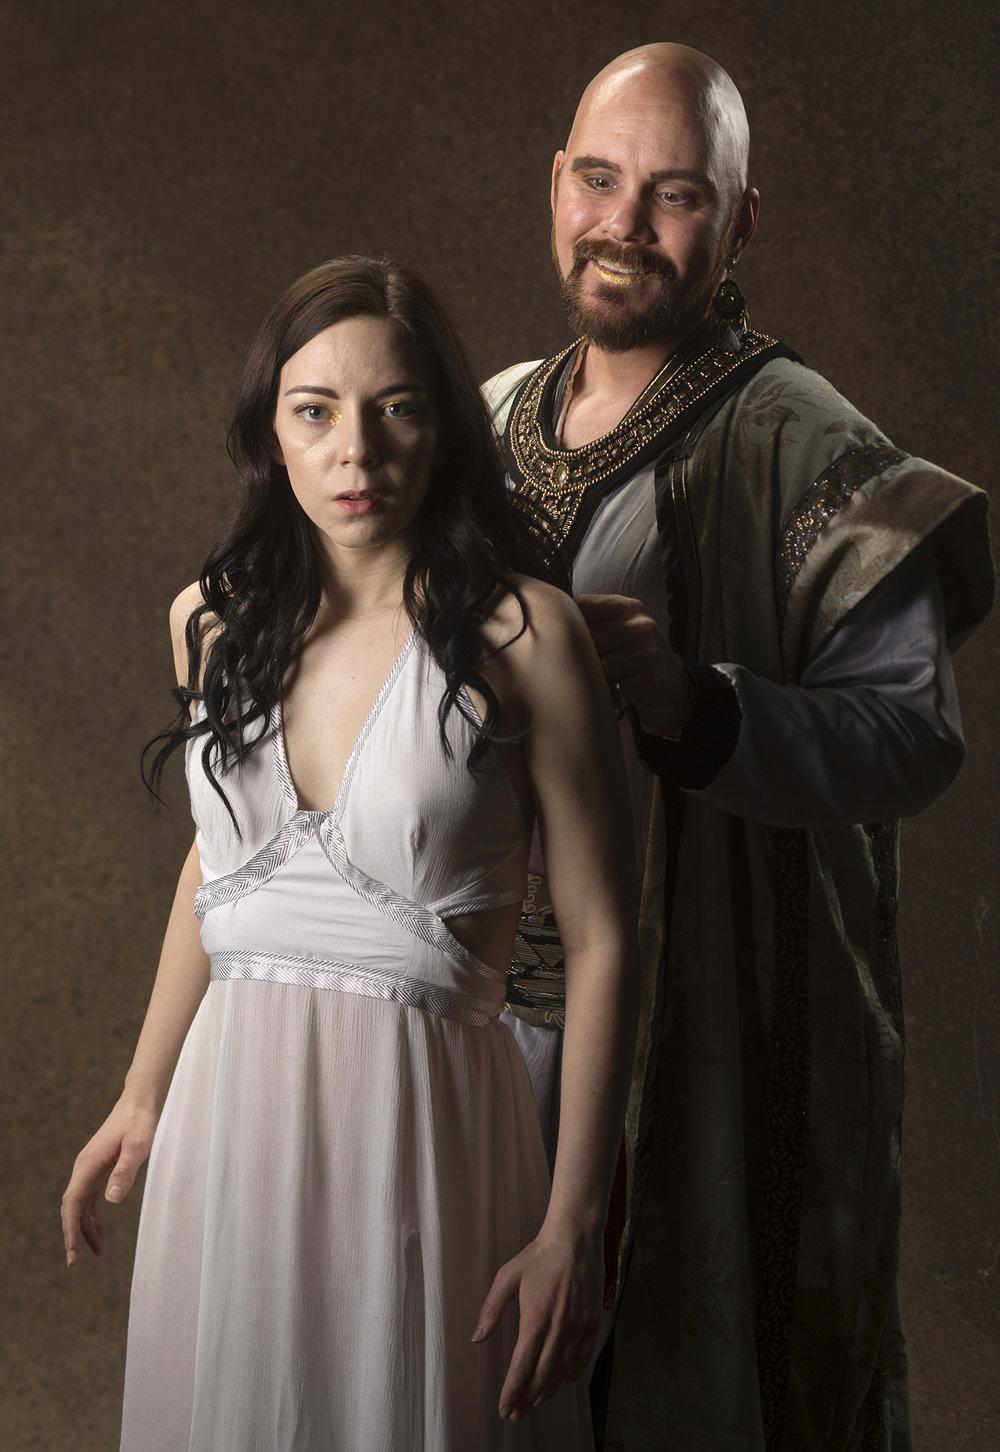 Christopher Younggren (Herod) and Gabrielle De Brequet (Salomé). Photo by Tim Fuller.